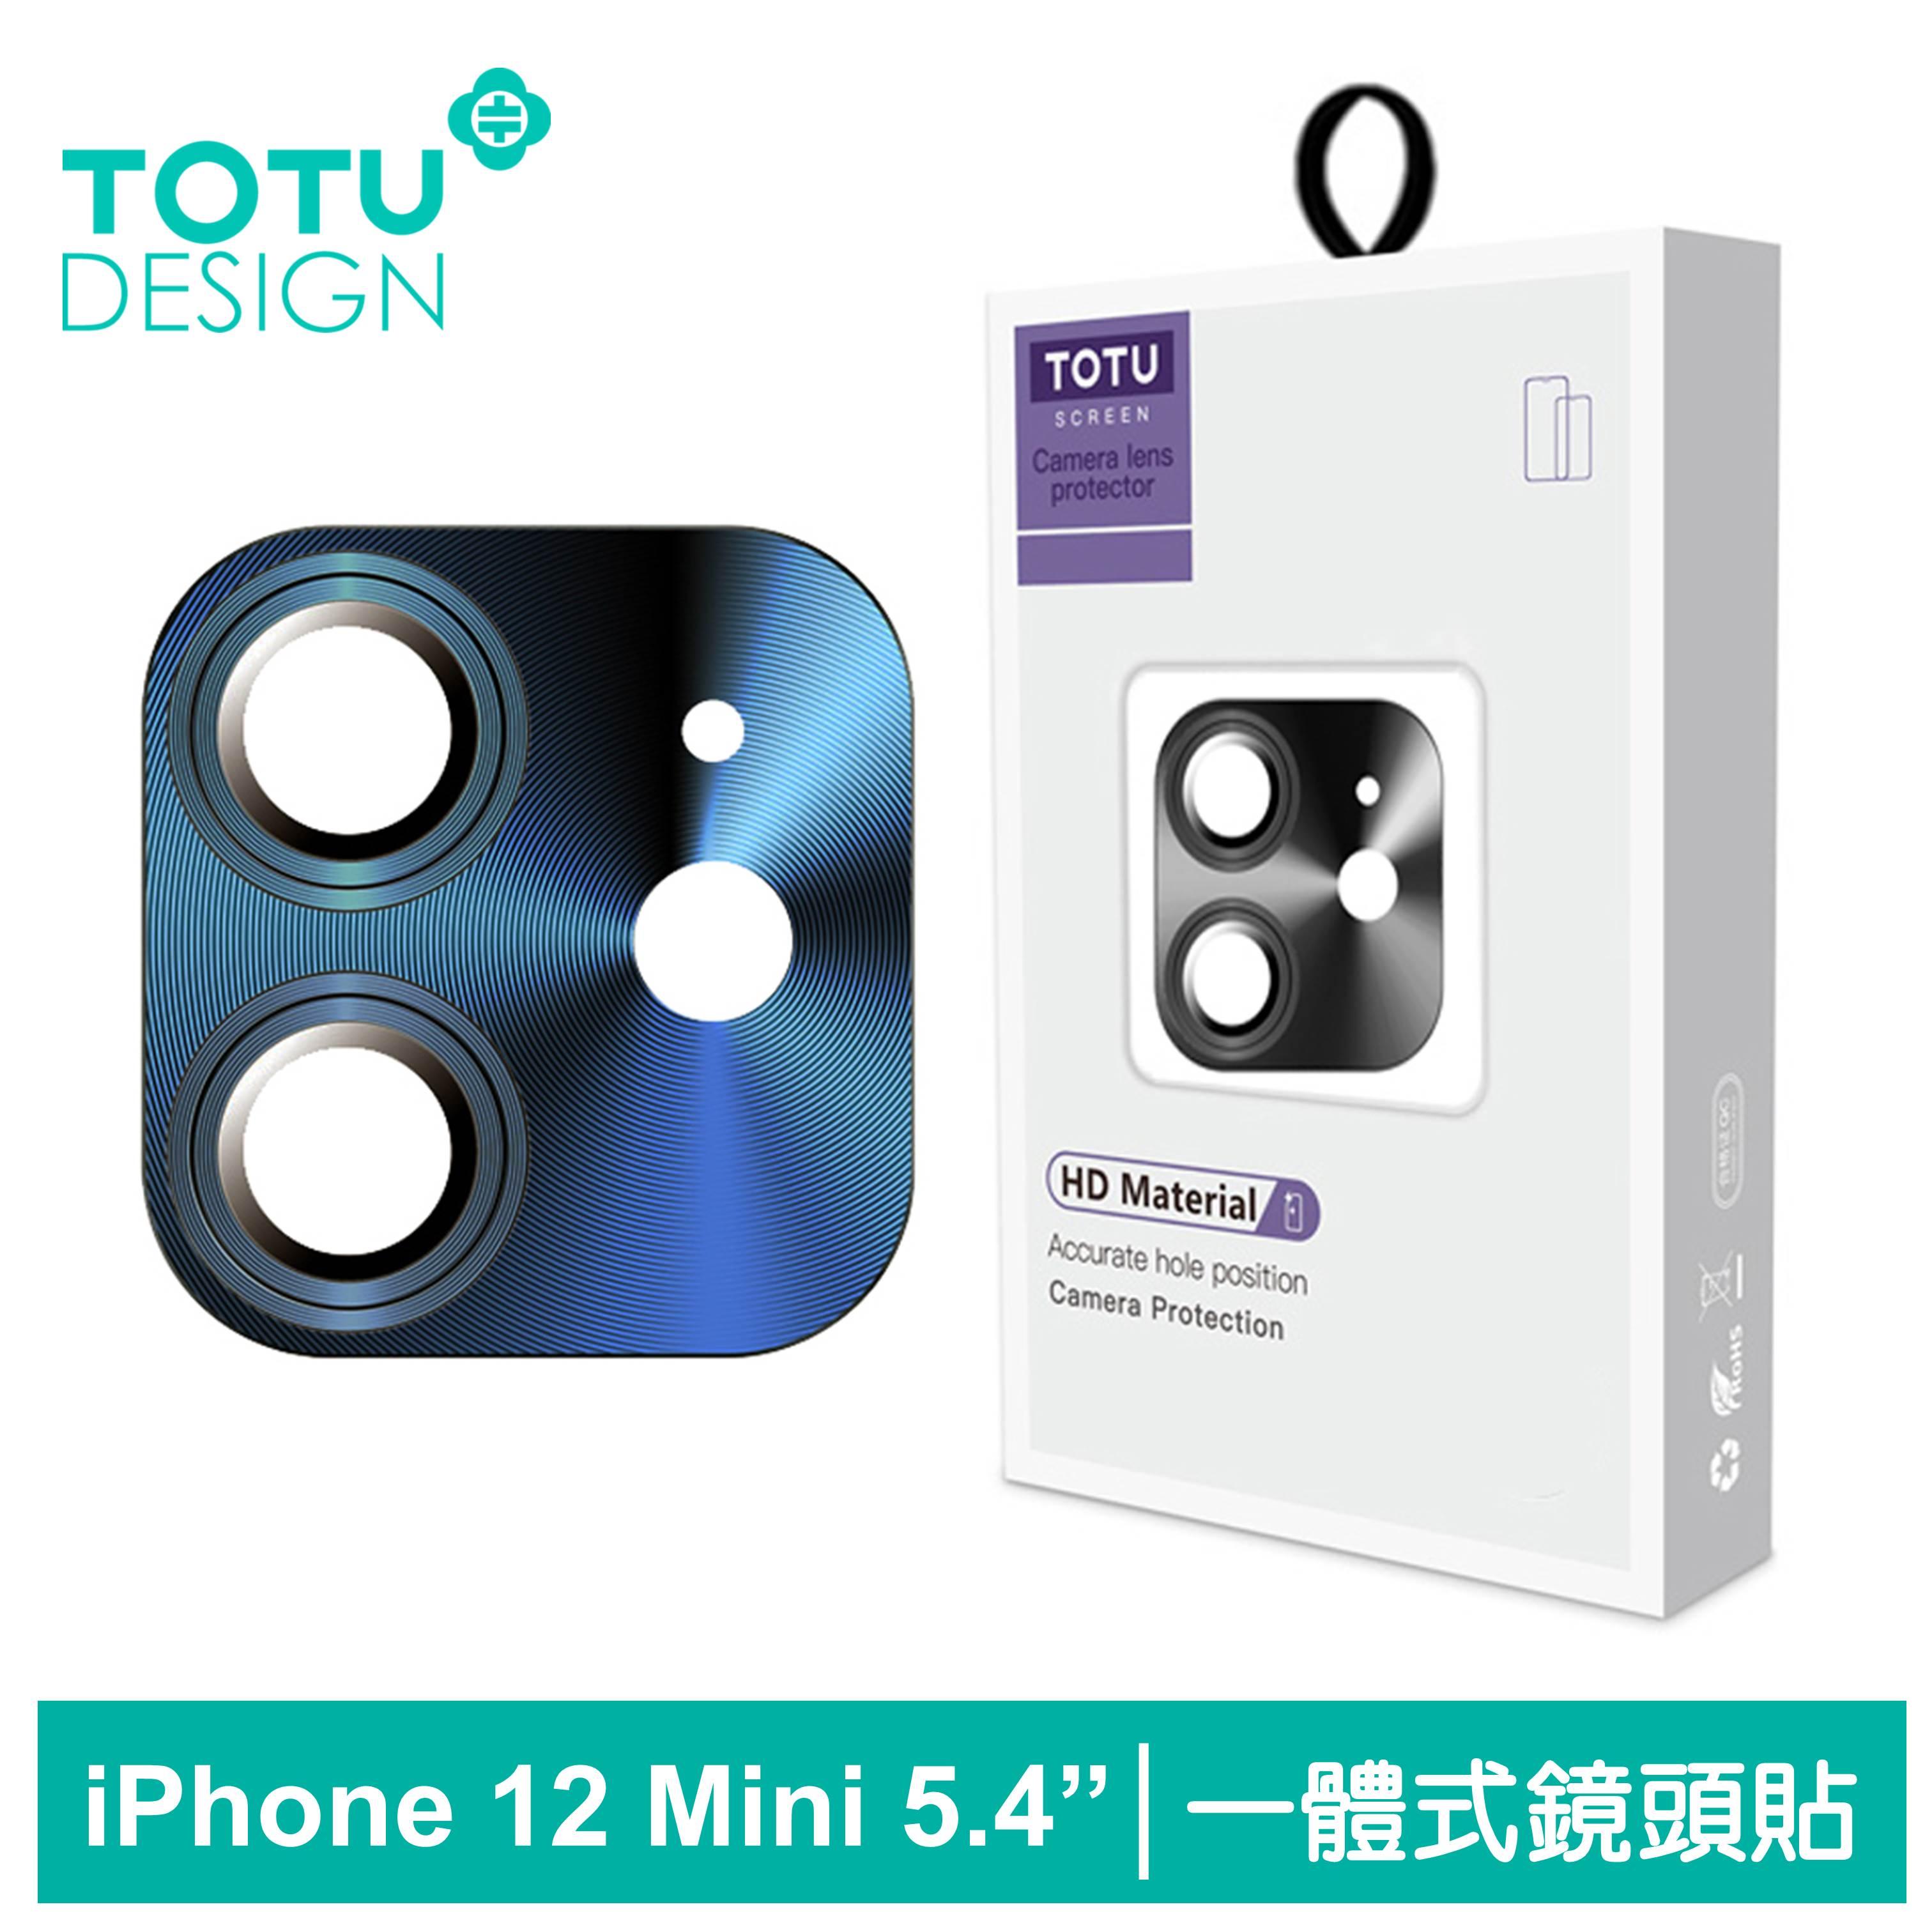 TOTU台灣官方 iPhone 12 Mini 鏡頭貼 i12 Mini 5.4吋 鋼化膜 保護貼 一體式鋁合金鋼化玻璃 鎧甲系列 藍色